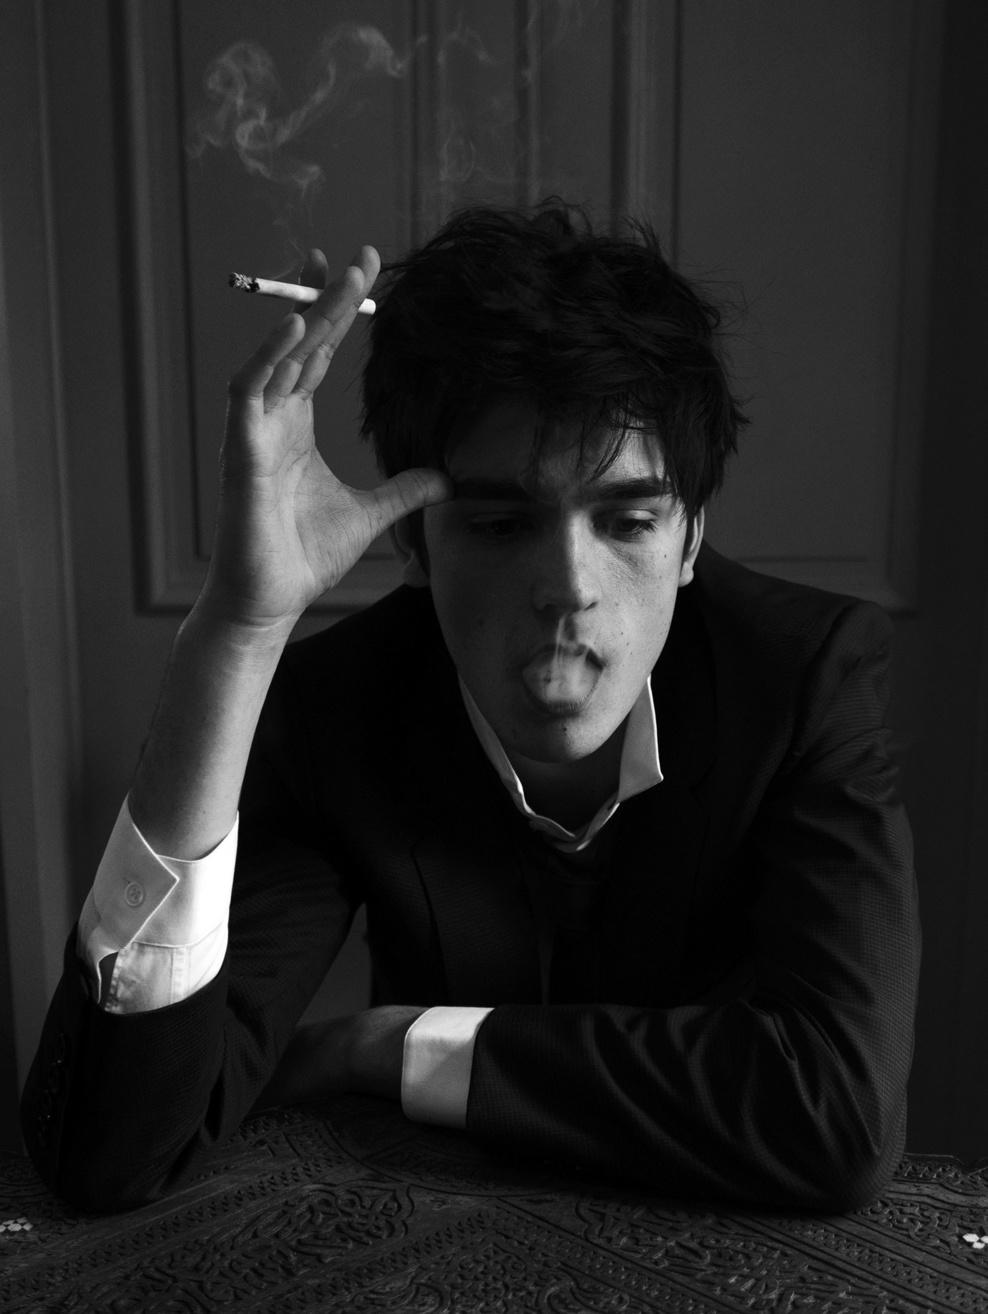 Alain-Fabien Delon par Ricardo Gomes